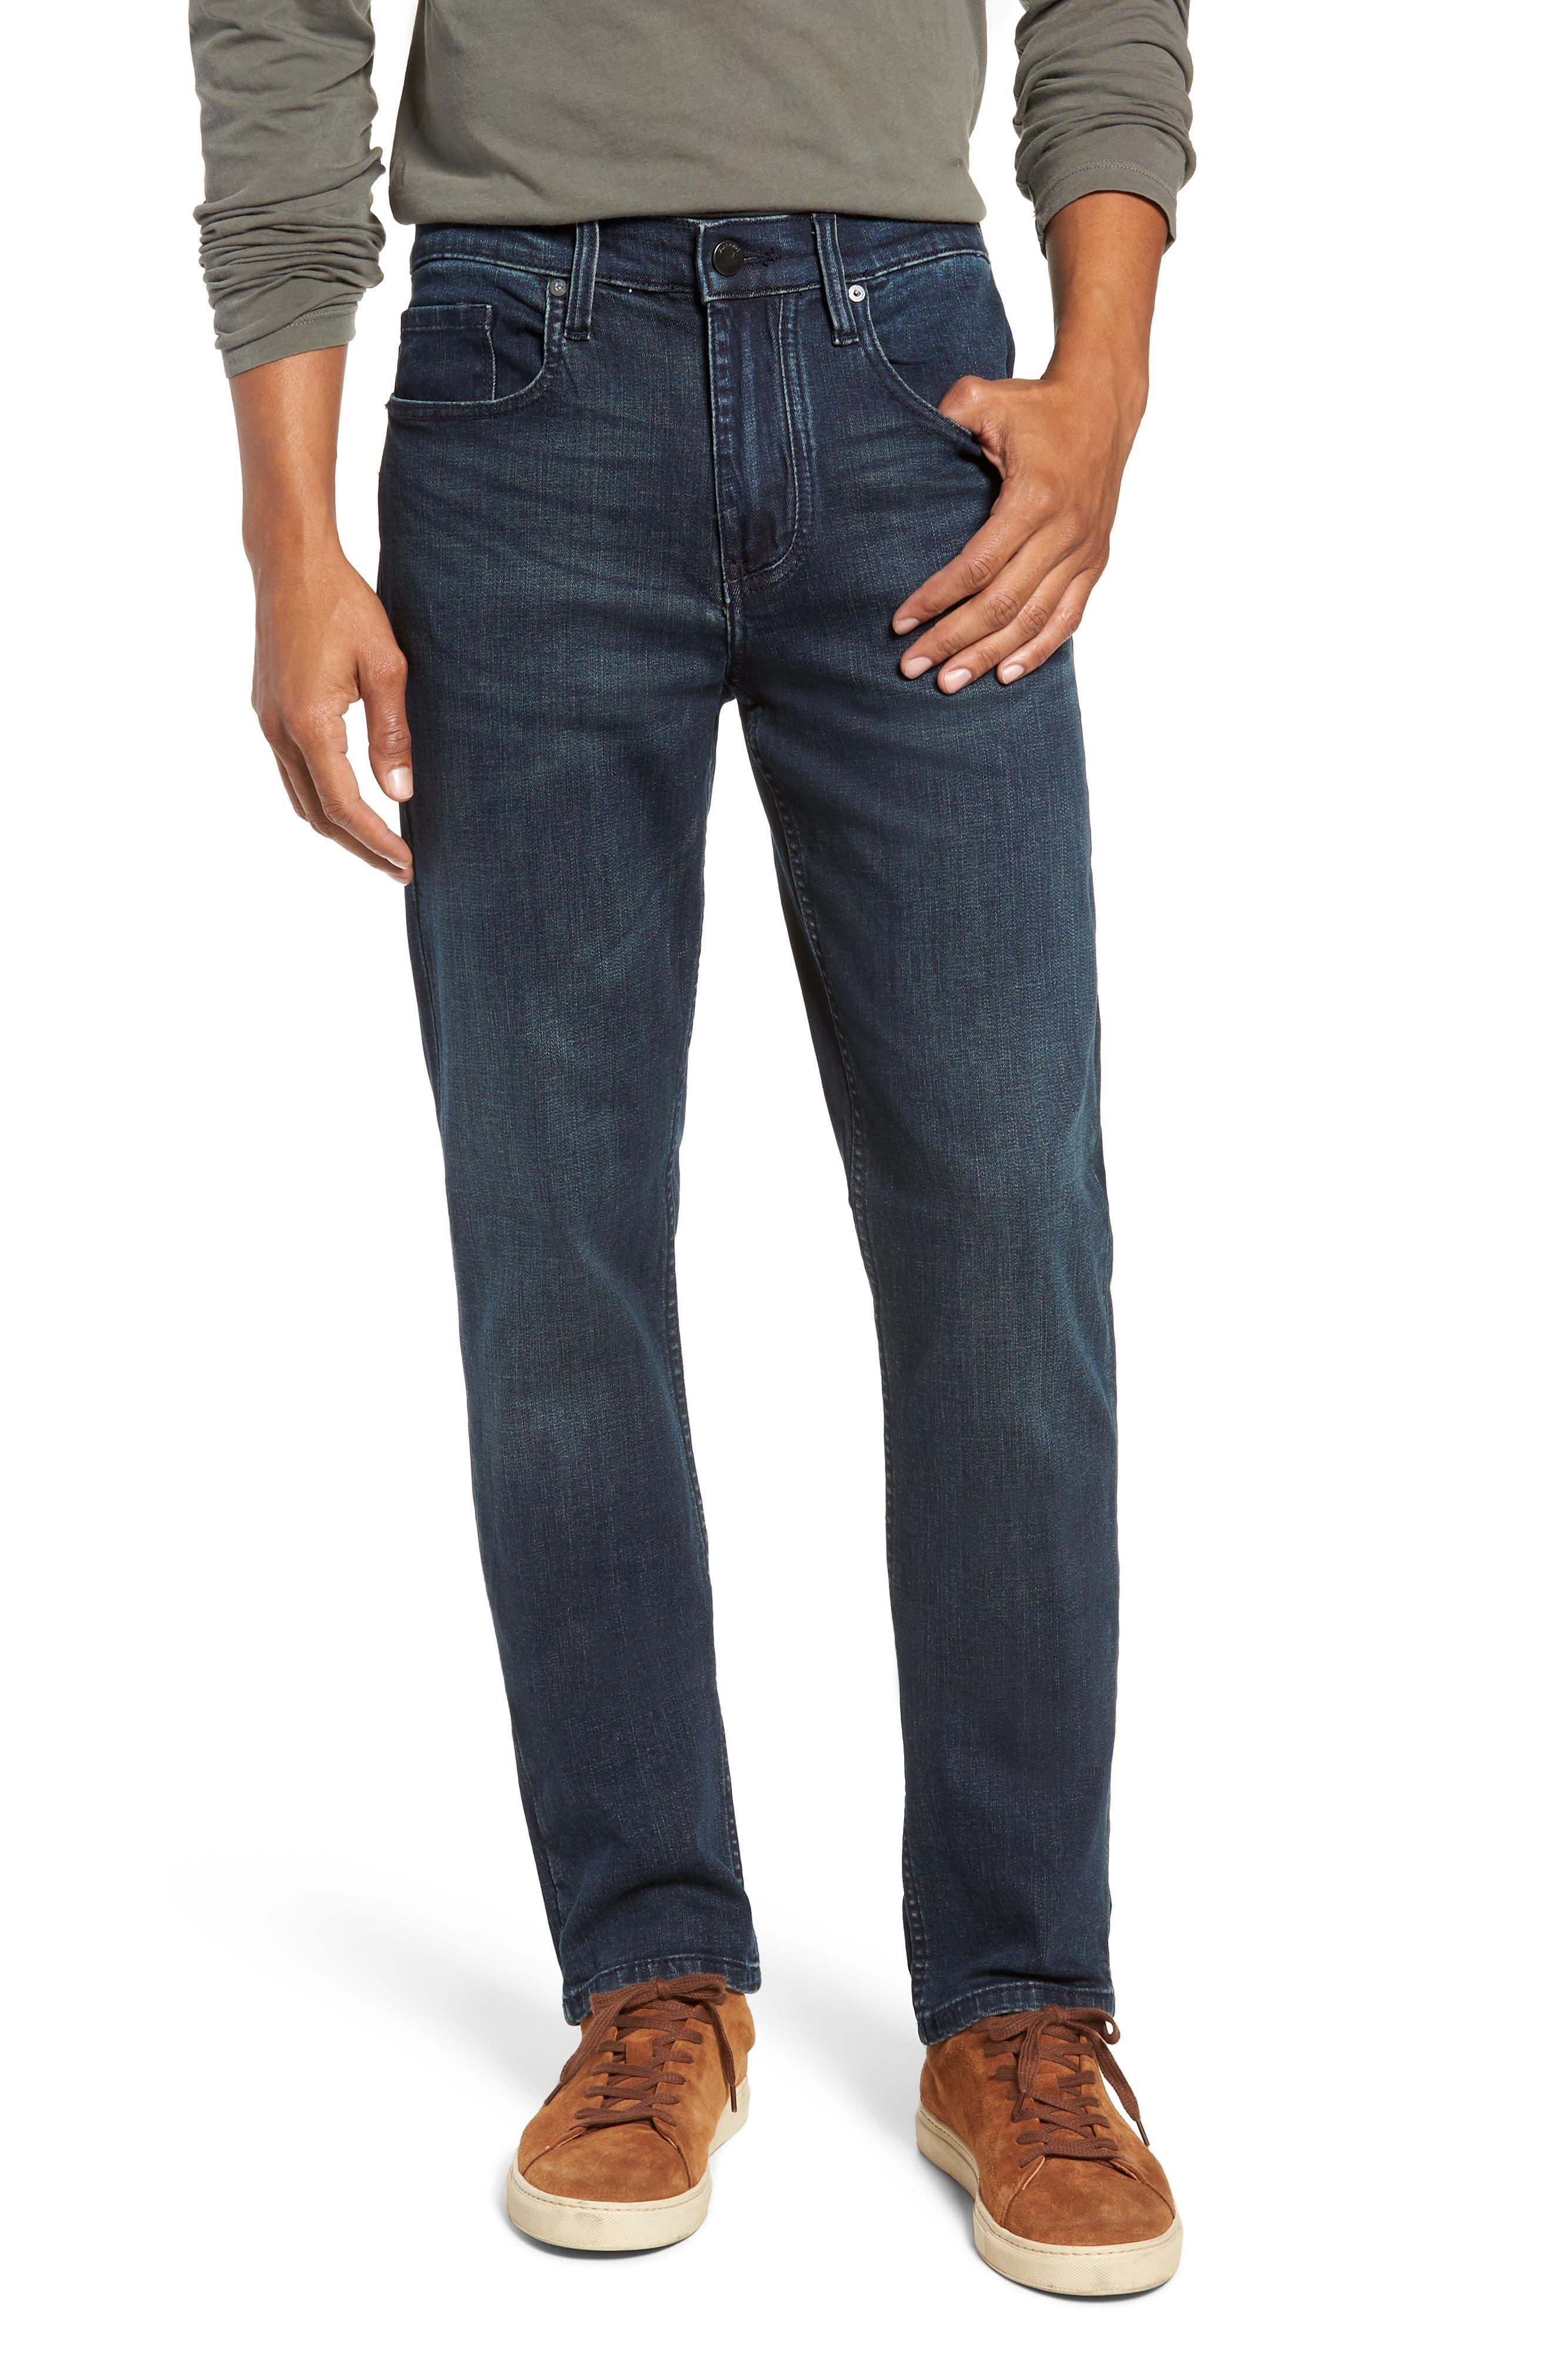 Stanton Straight Leg Jeans,                         Main,                         color, WORTHLESS TENDENCY